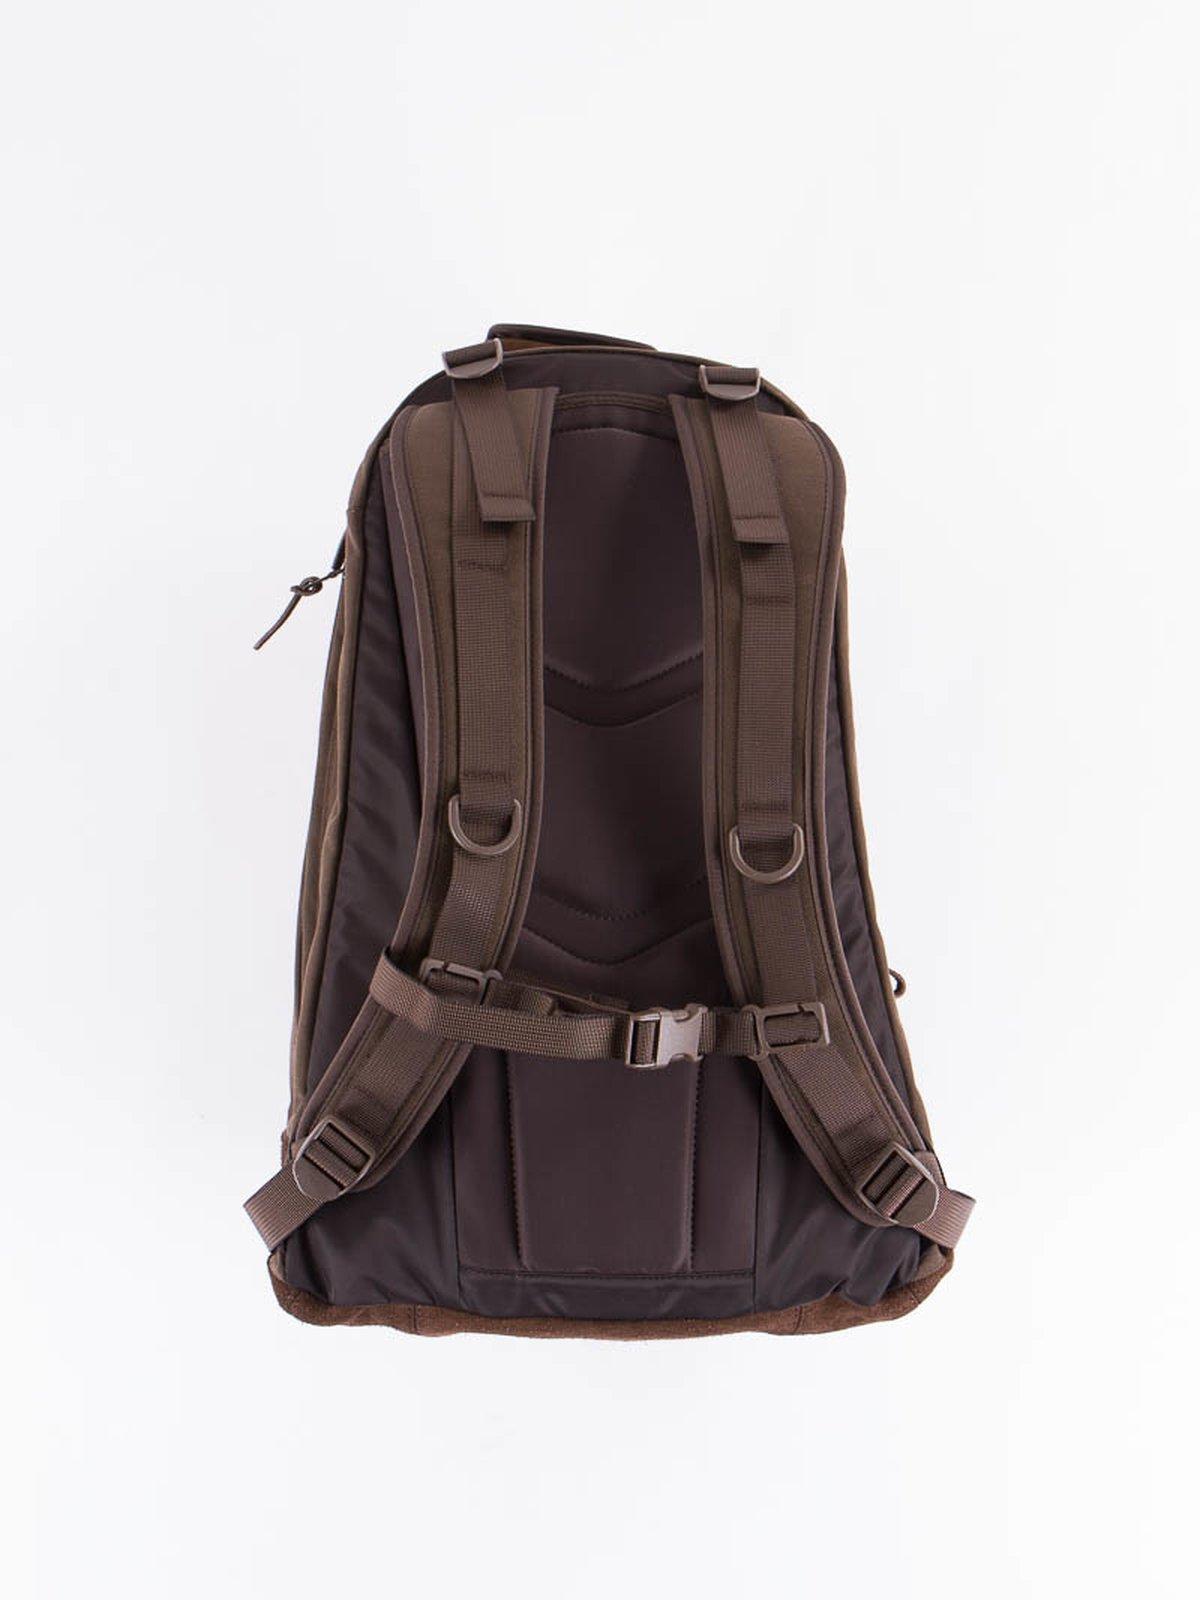 Brown 22L Ballistic Backpack - Image 7